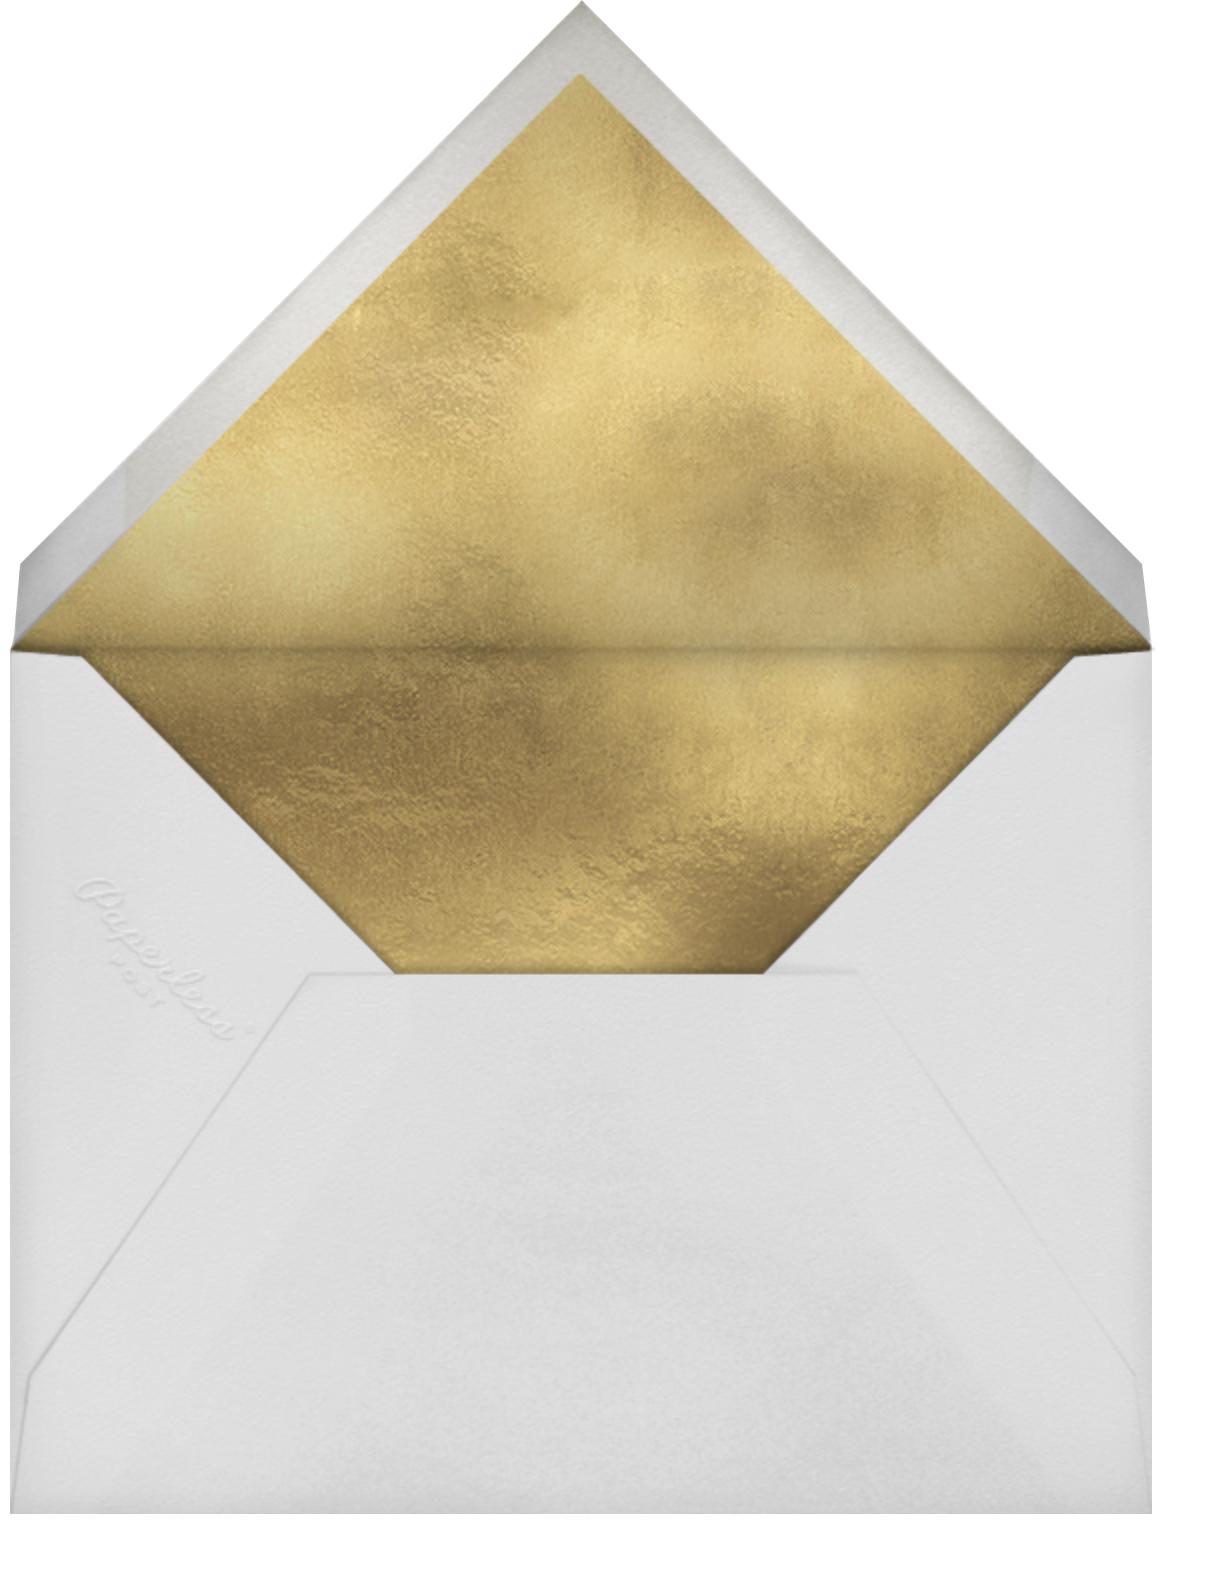 Better Halves - Lilac - kate spade new york - Birthday - envelope back